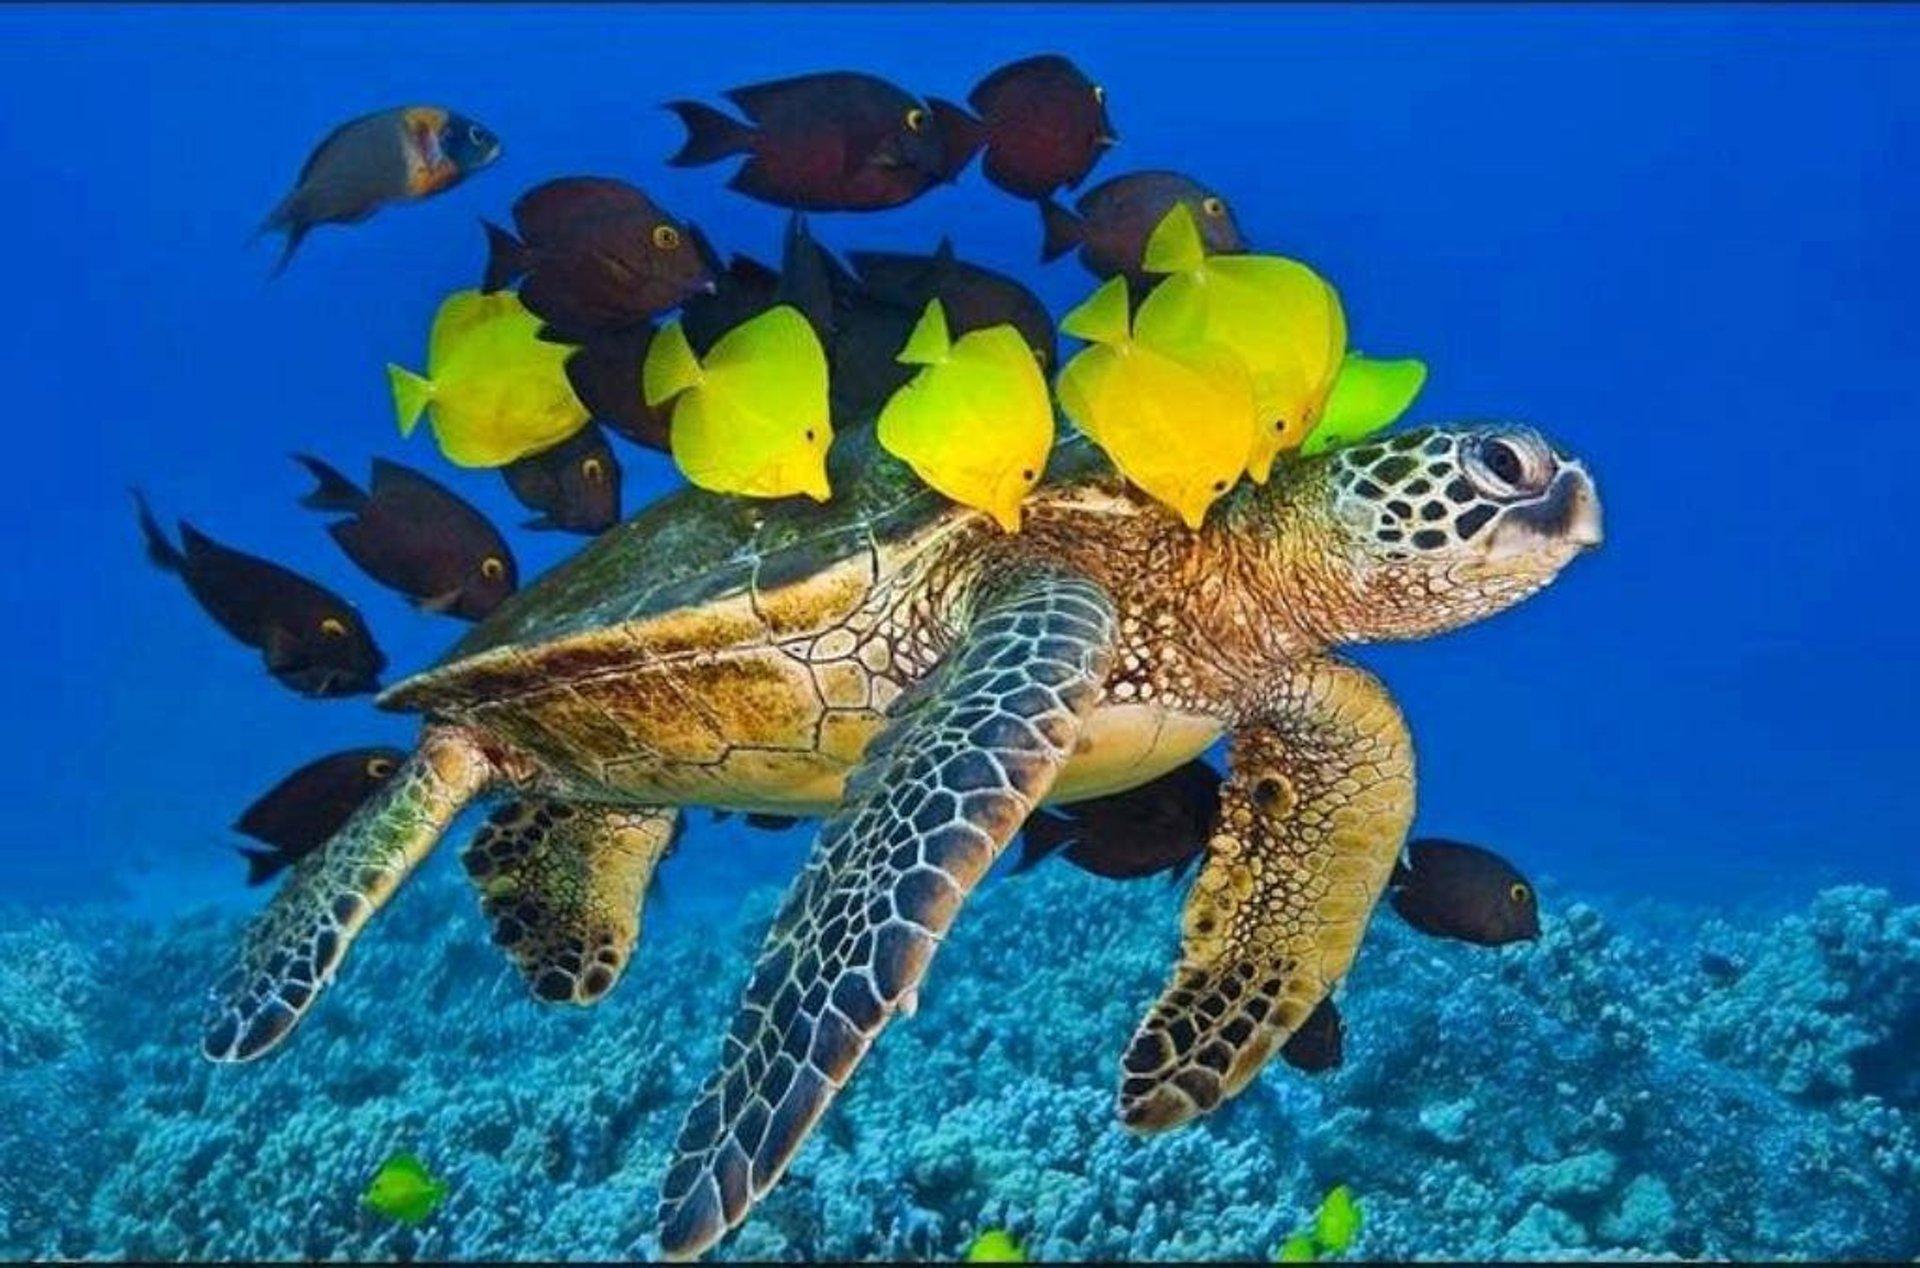 Scuba Diving in Vietnam - Best Season